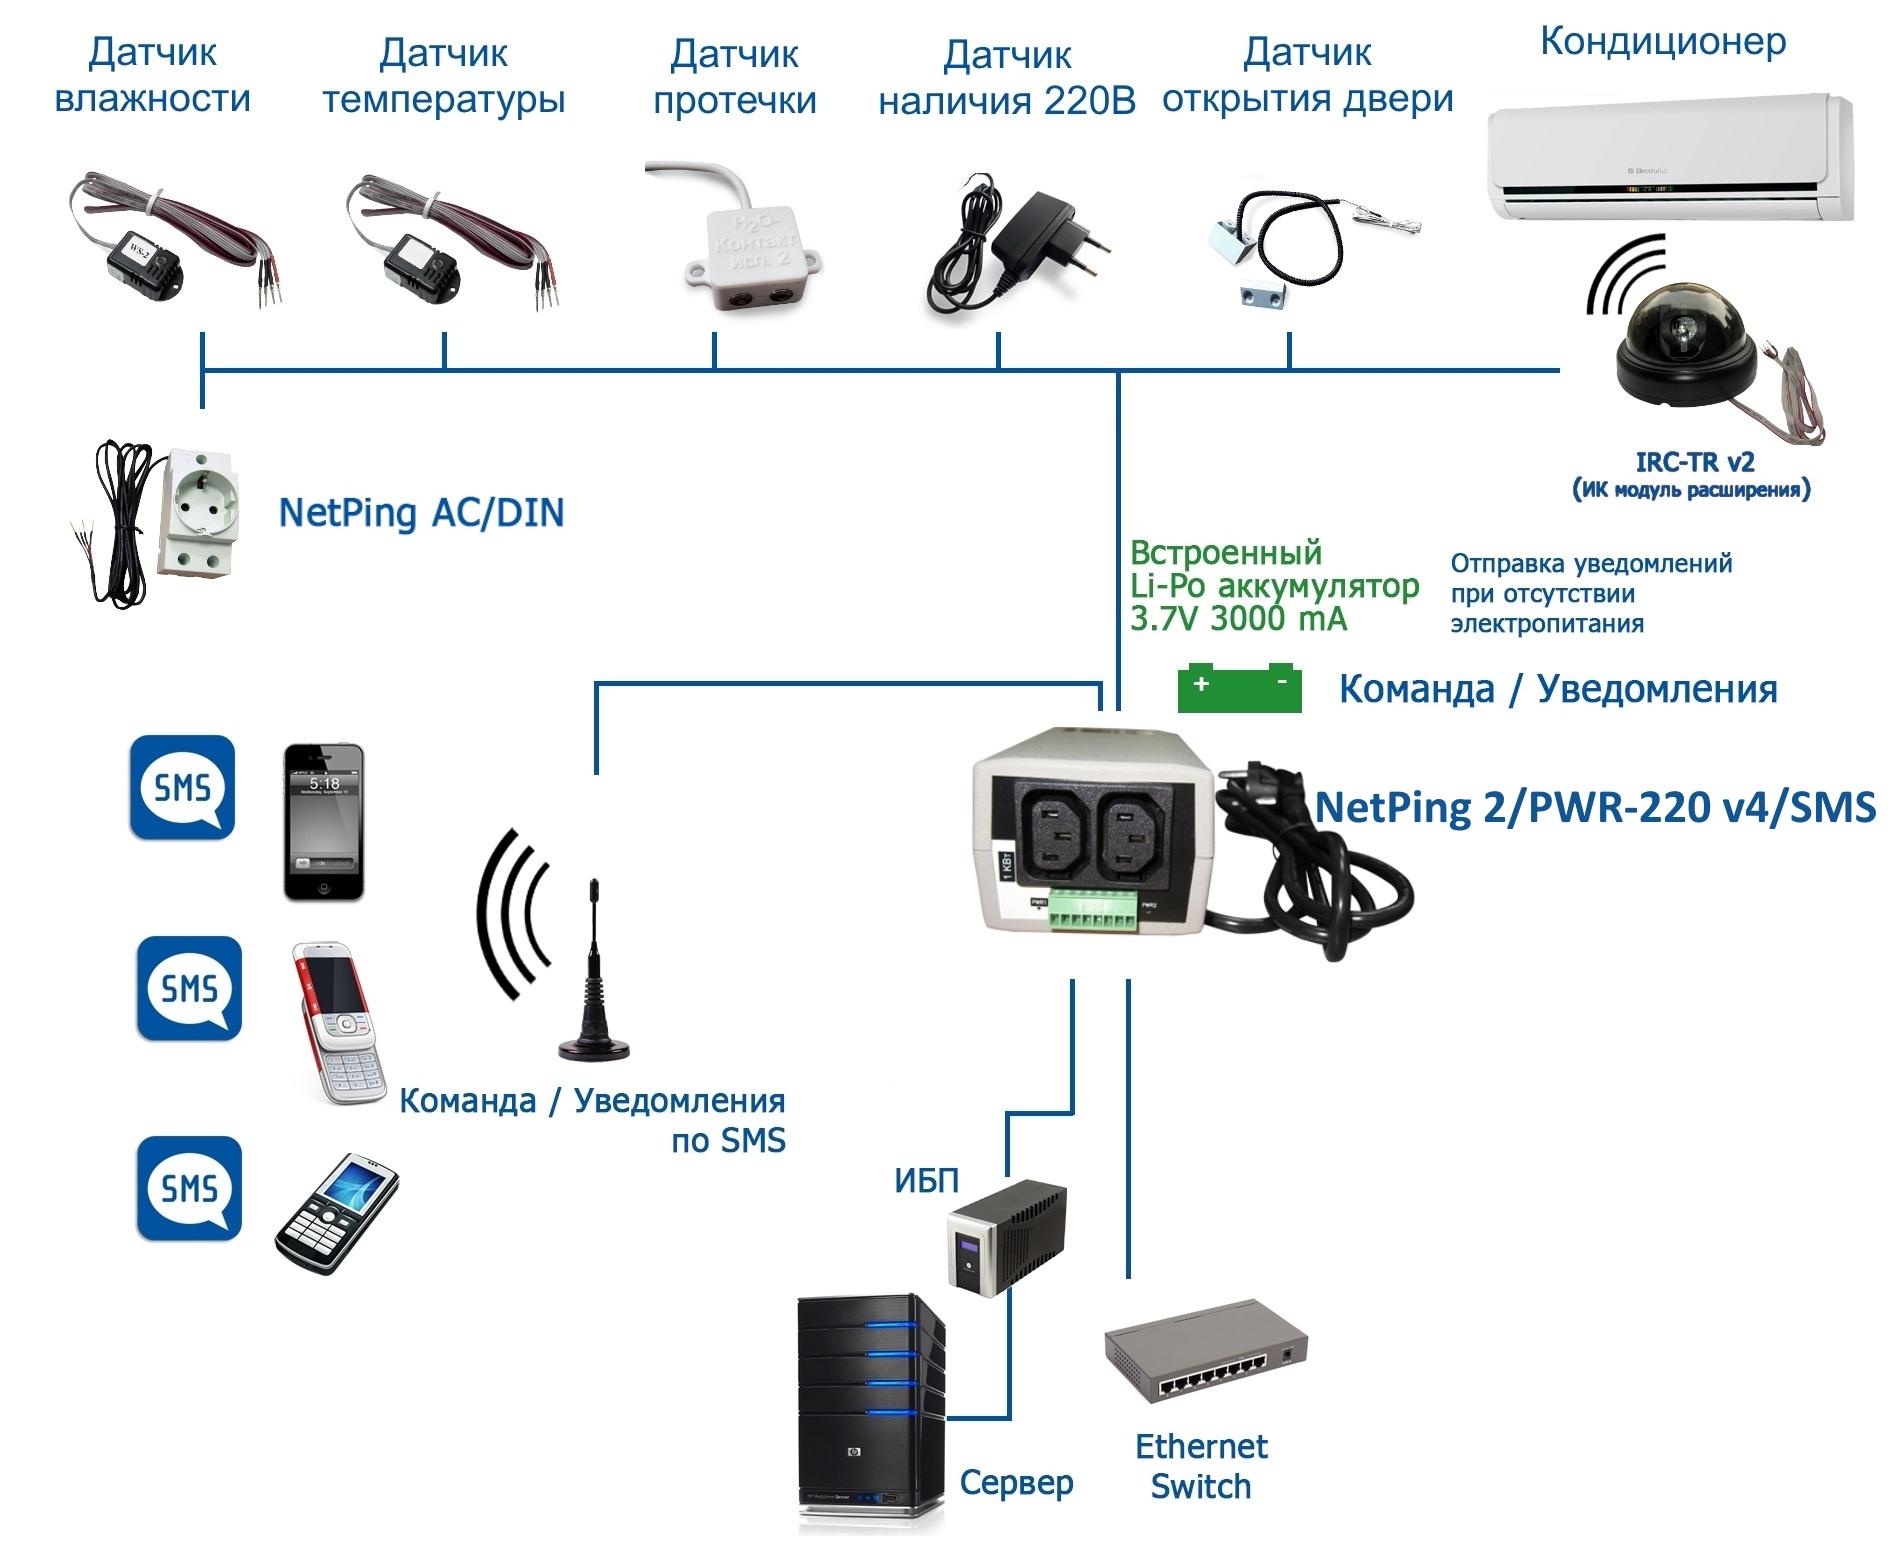 NetPing 2PWR-220 v4SMS - подключение датчиков